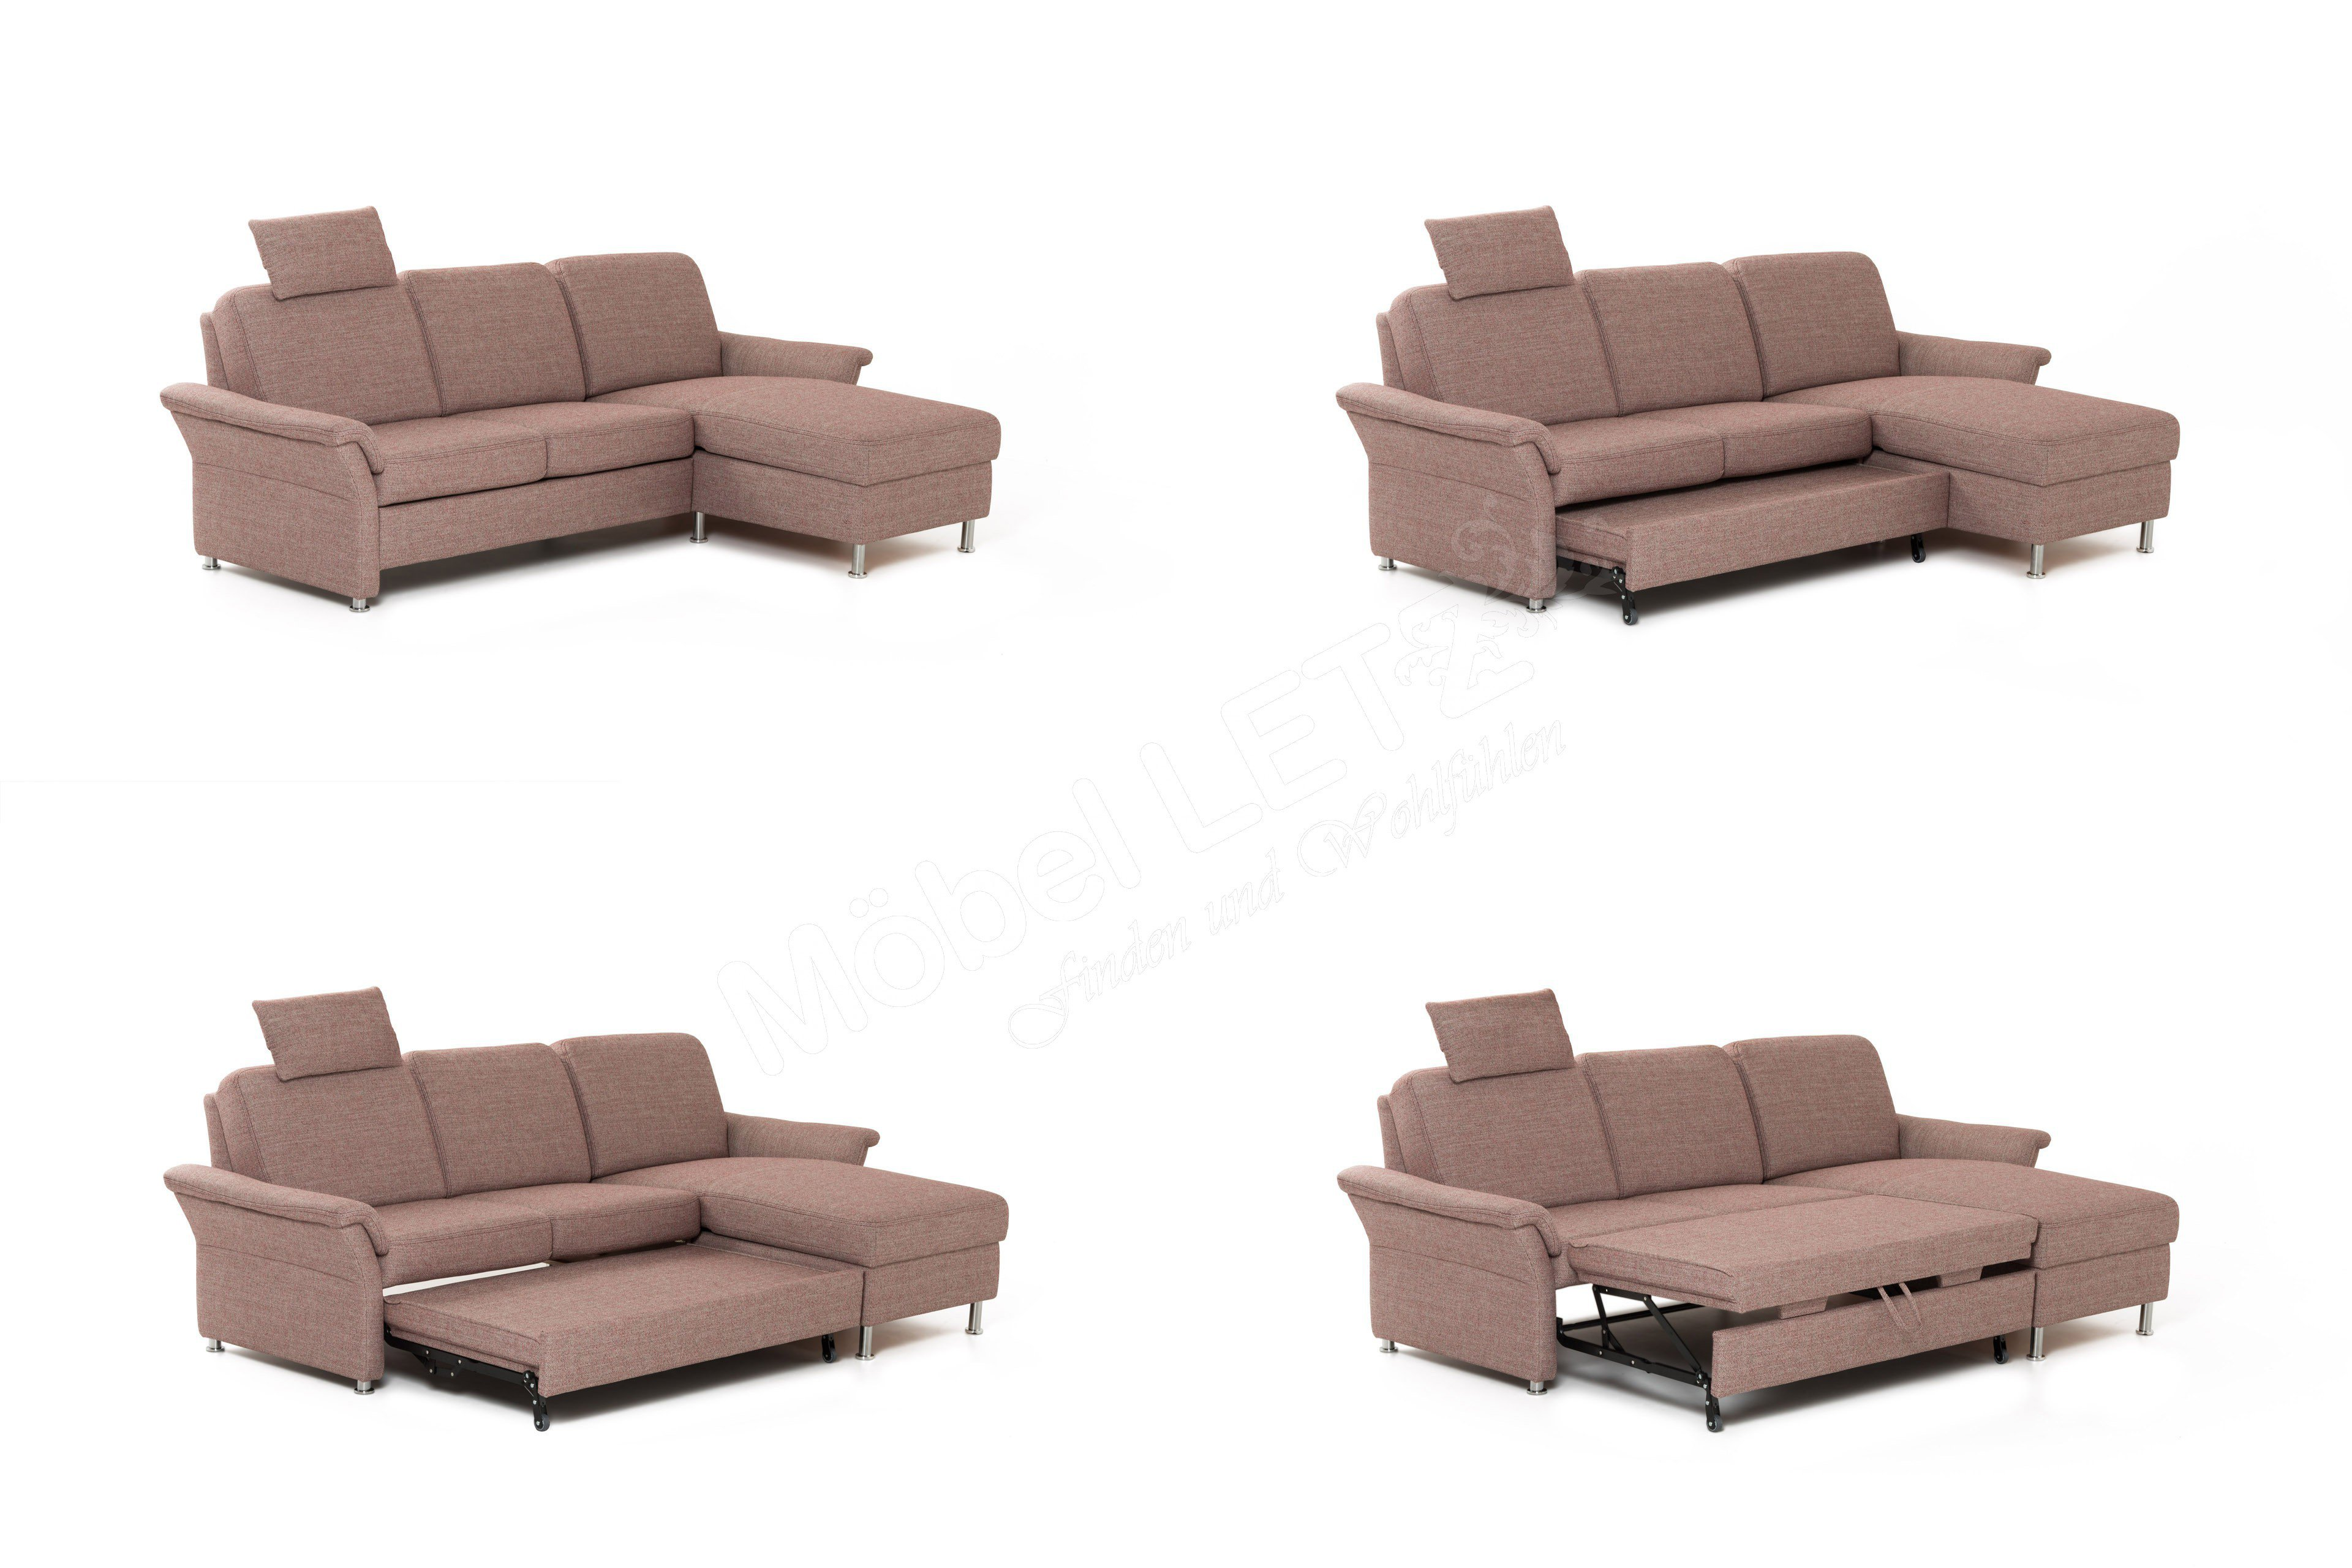 pm oelsa namo couchgarnitur in beige bordeaux m bel letz ihr online shop. Black Bedroom Furniture Sets. Home Design Ideas